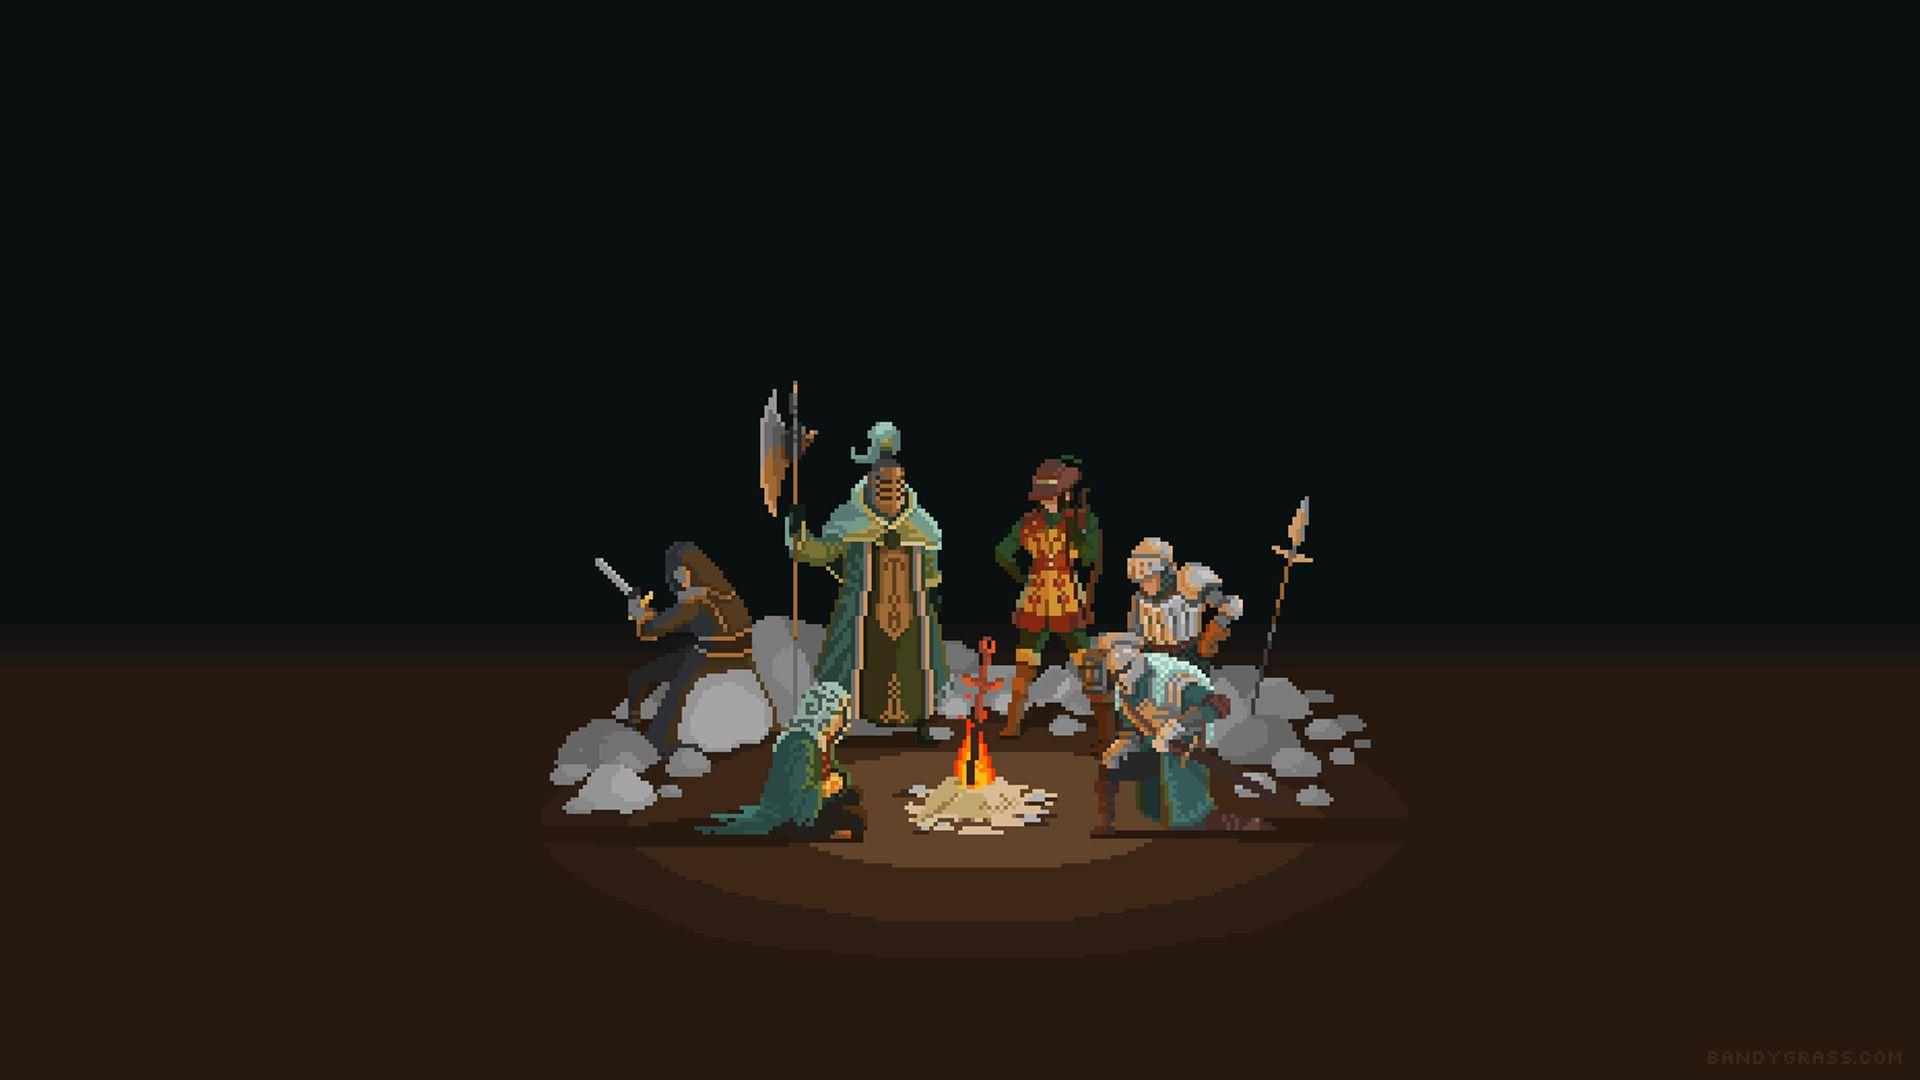 Dark Souls 3 Animated Background Best Wallpaper Hd Dark Souls Animation Background Dark Souls 3